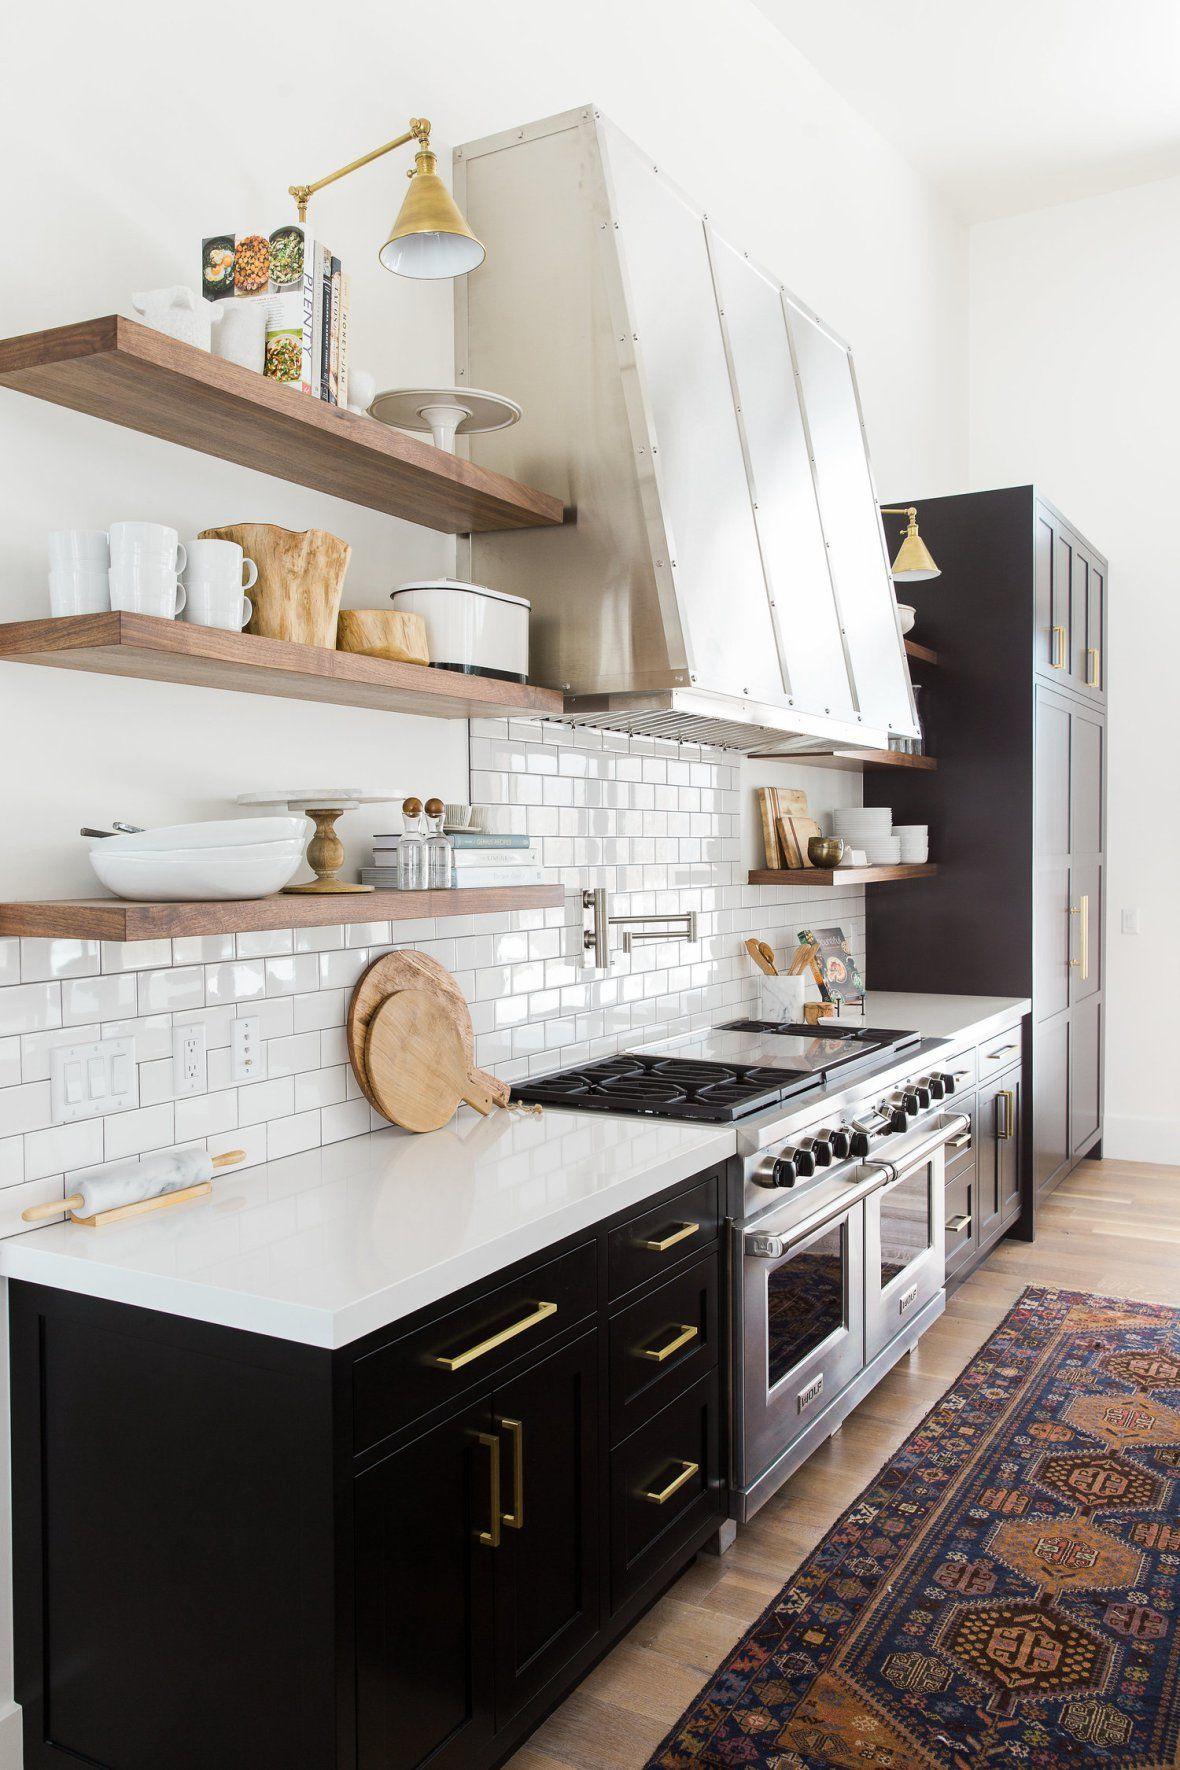 for the love of open shelves modern farmhouse kitchens interior design kitchen modern on farmhouse kitchen open shelves id=97184